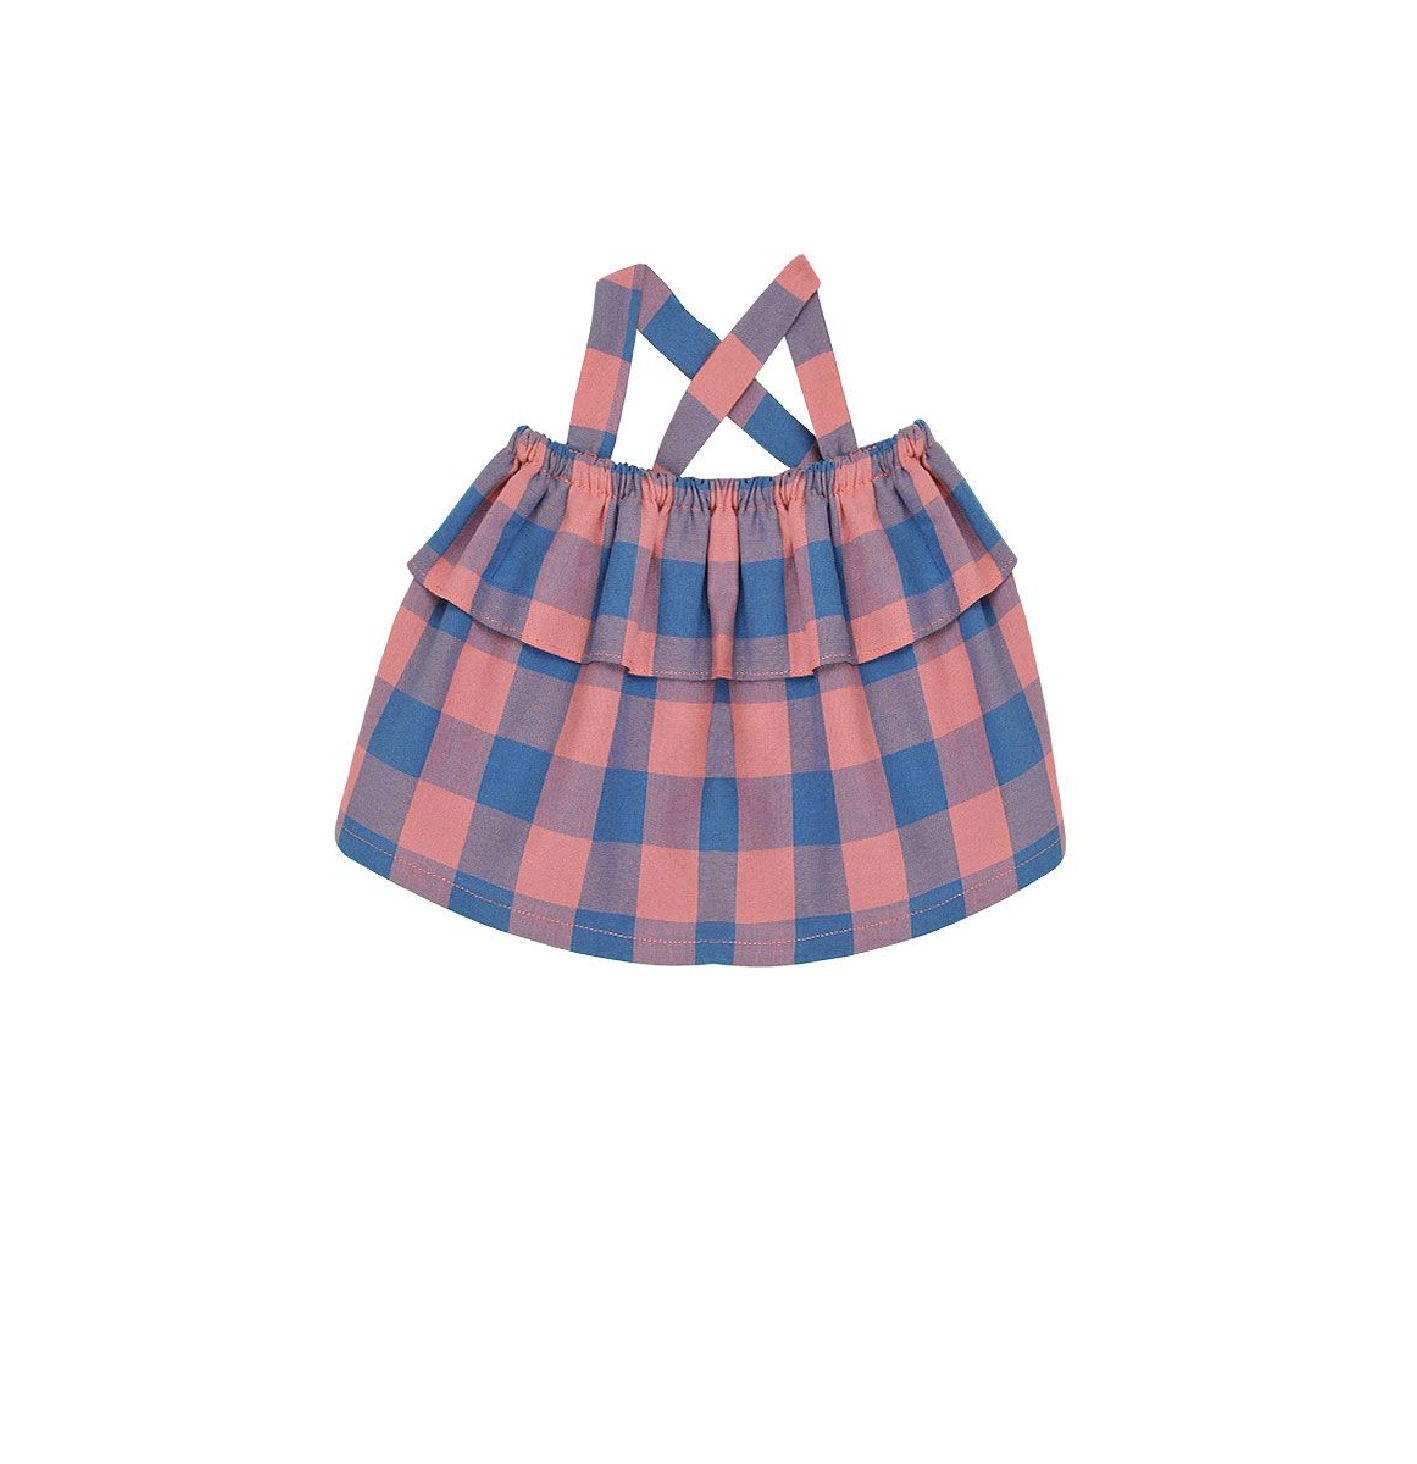 Bonnet à Pompon 西班牙時尚童裝 / 復古格紋吊帶上衣